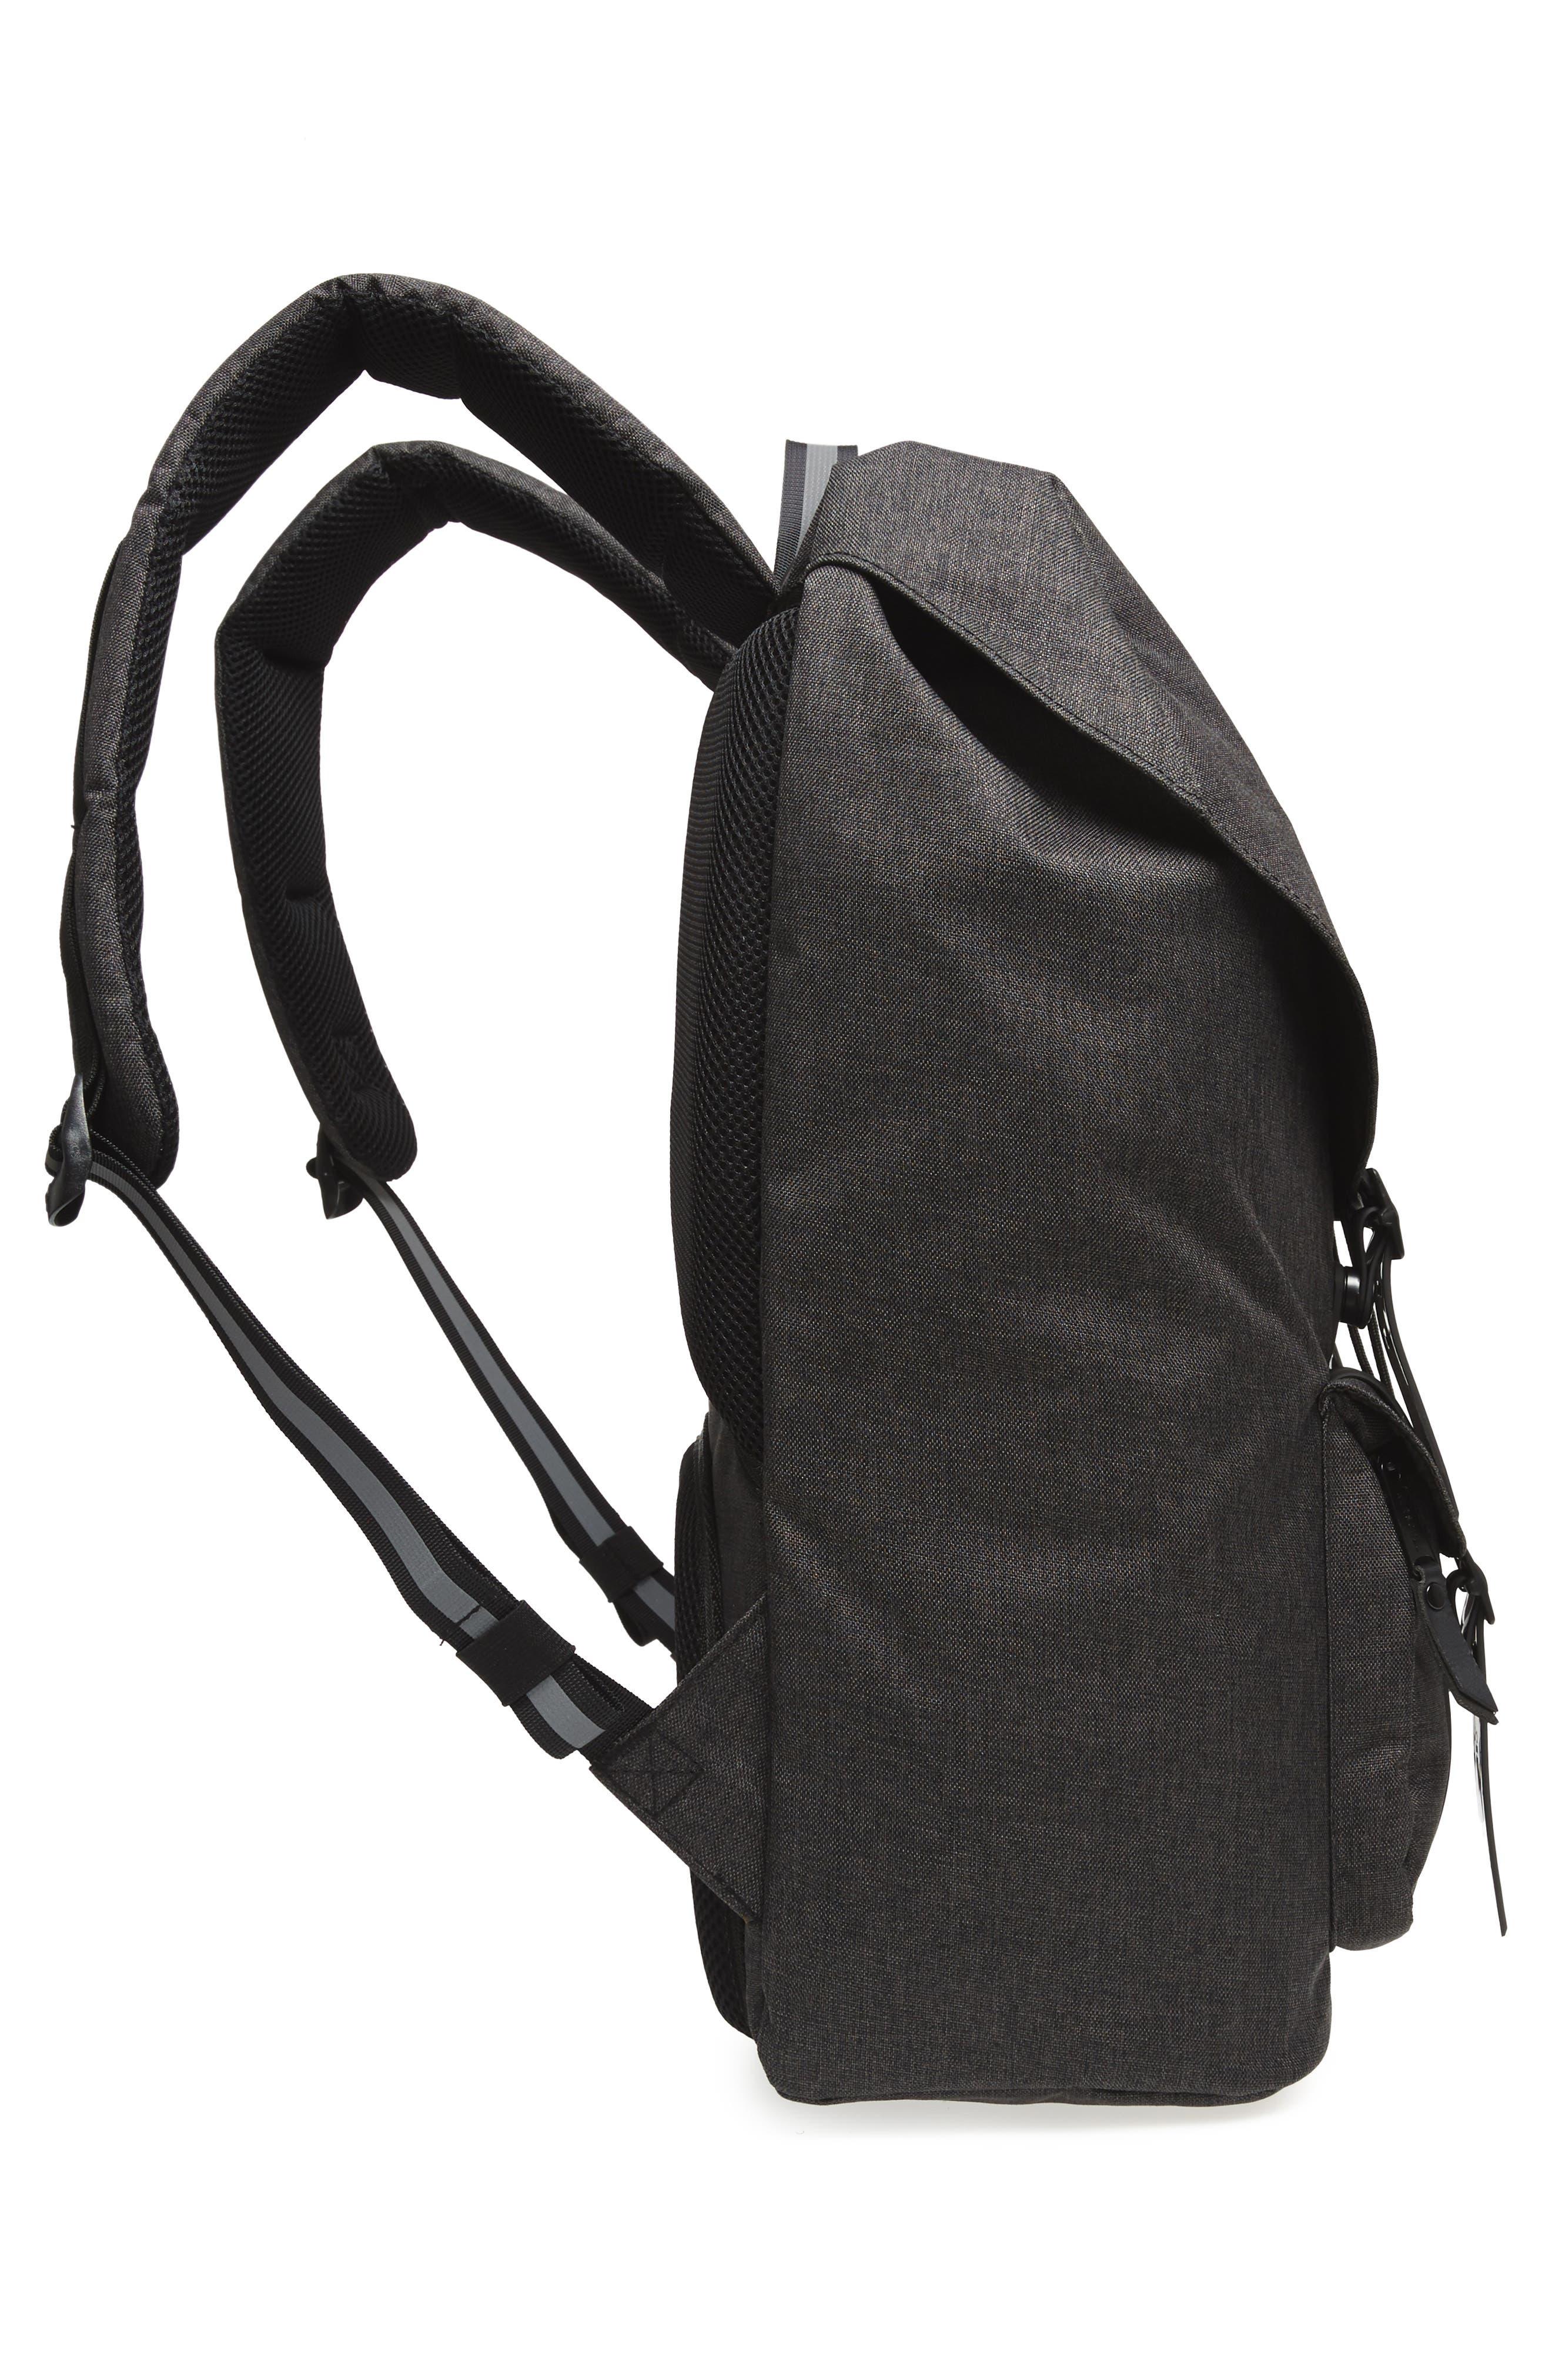 Little America - Reflective Backpack,                             Alternate thumbnail 5, color,                             147